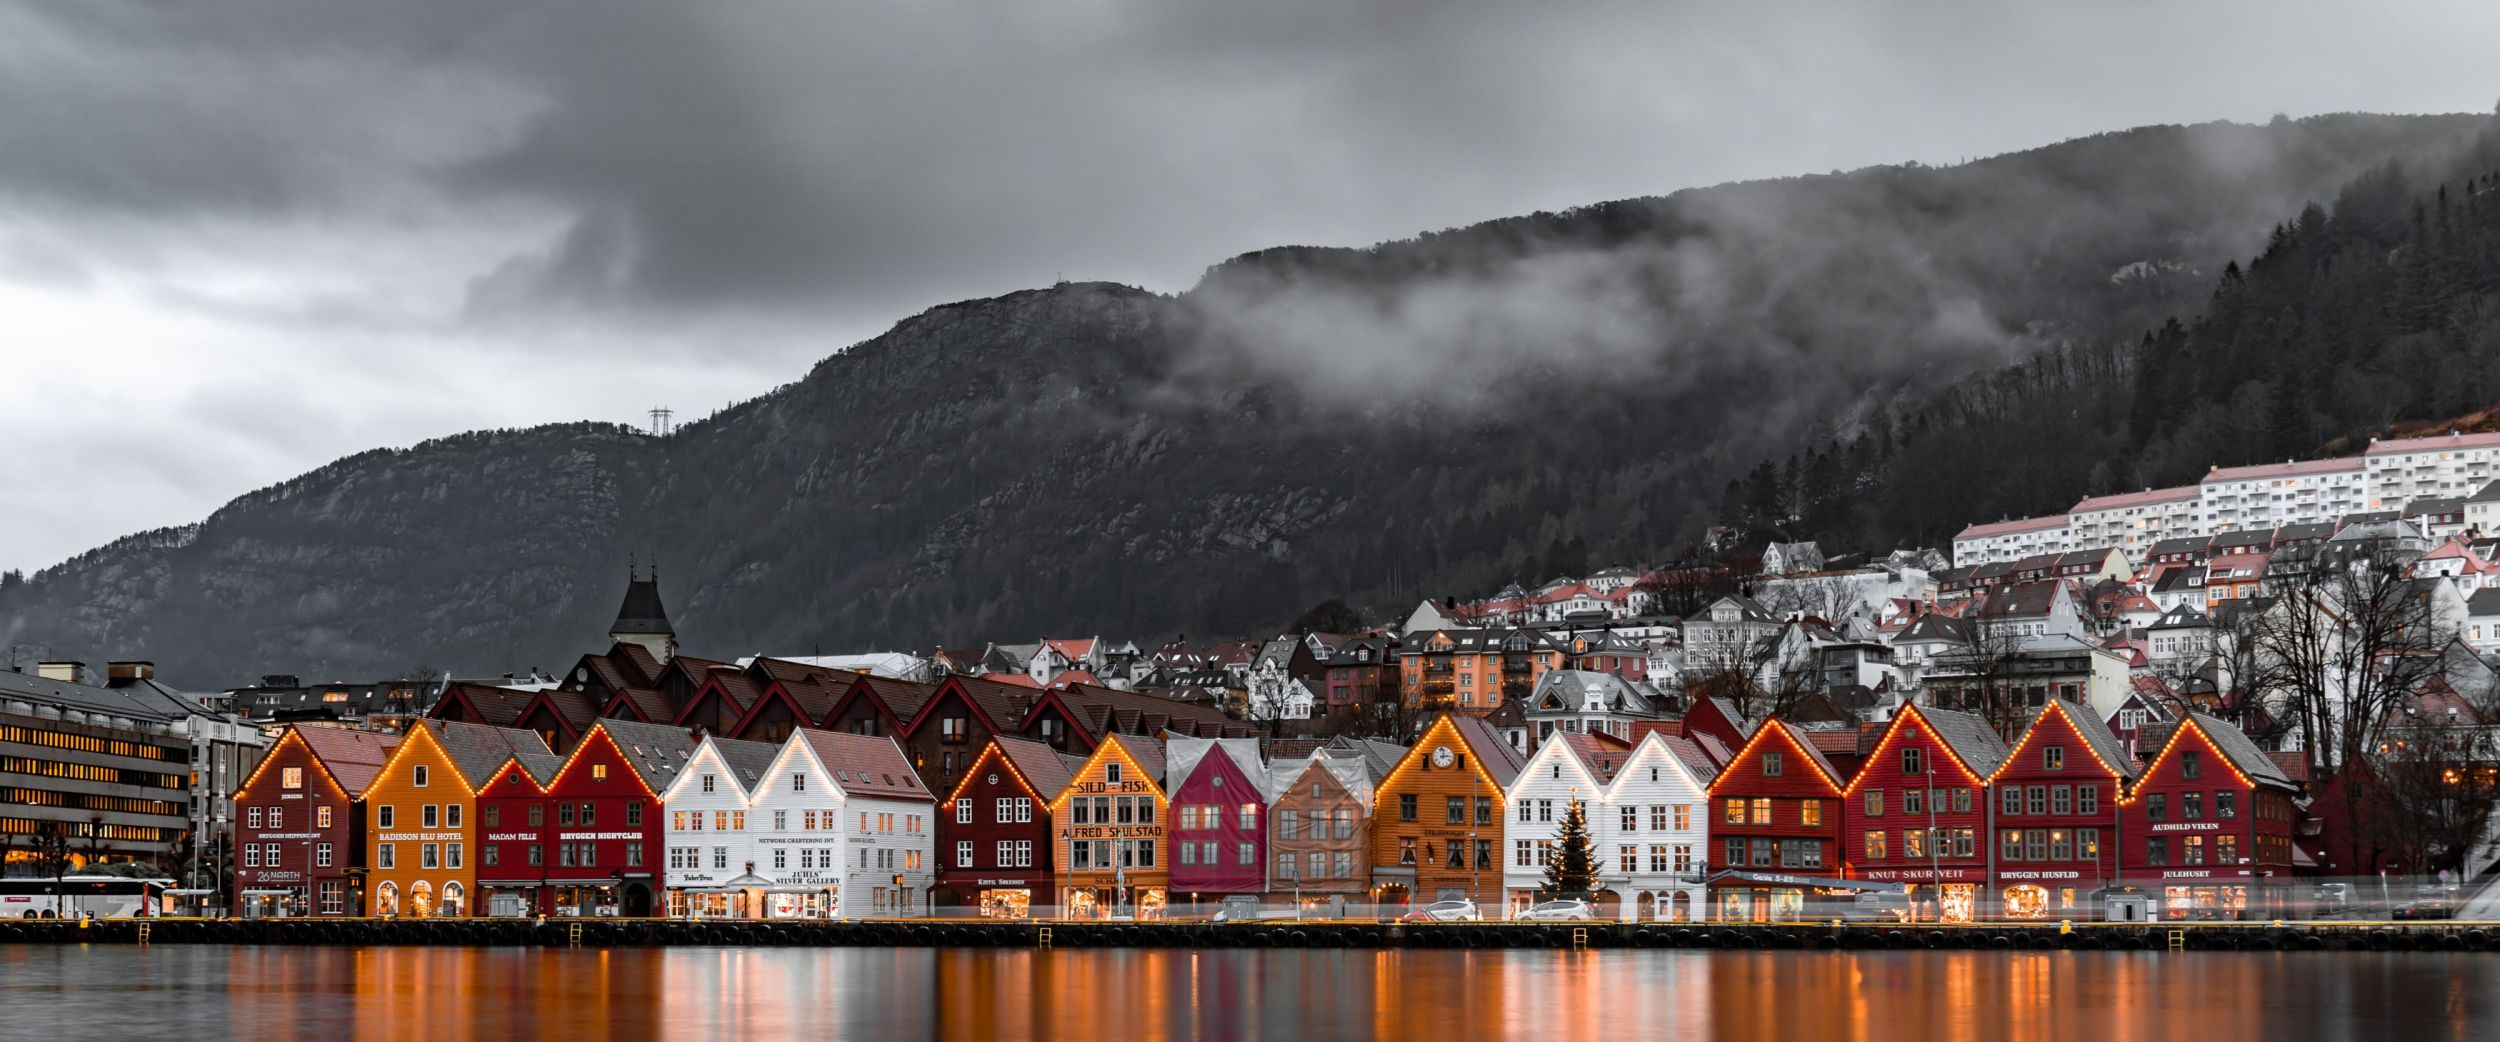 A foggy day in Bergen. Photo: Michael Fousert, Unsplash